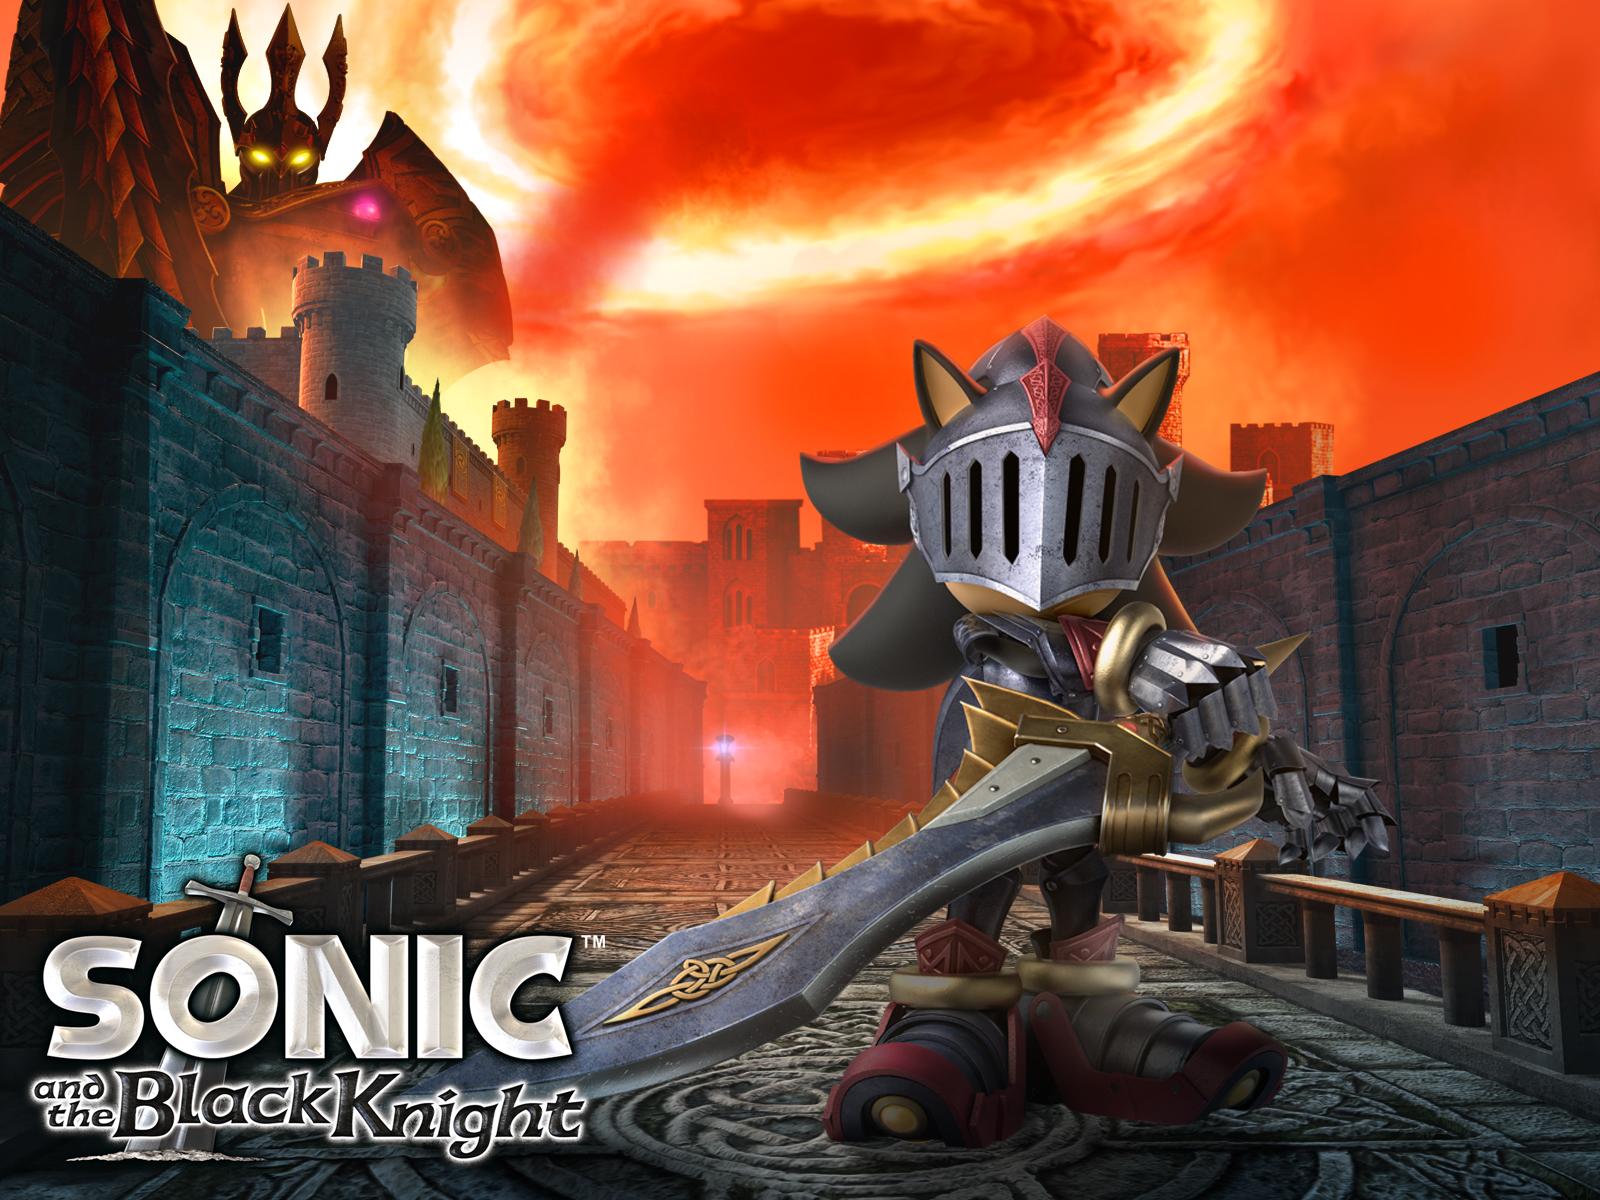 lancelot the knight (shadow).